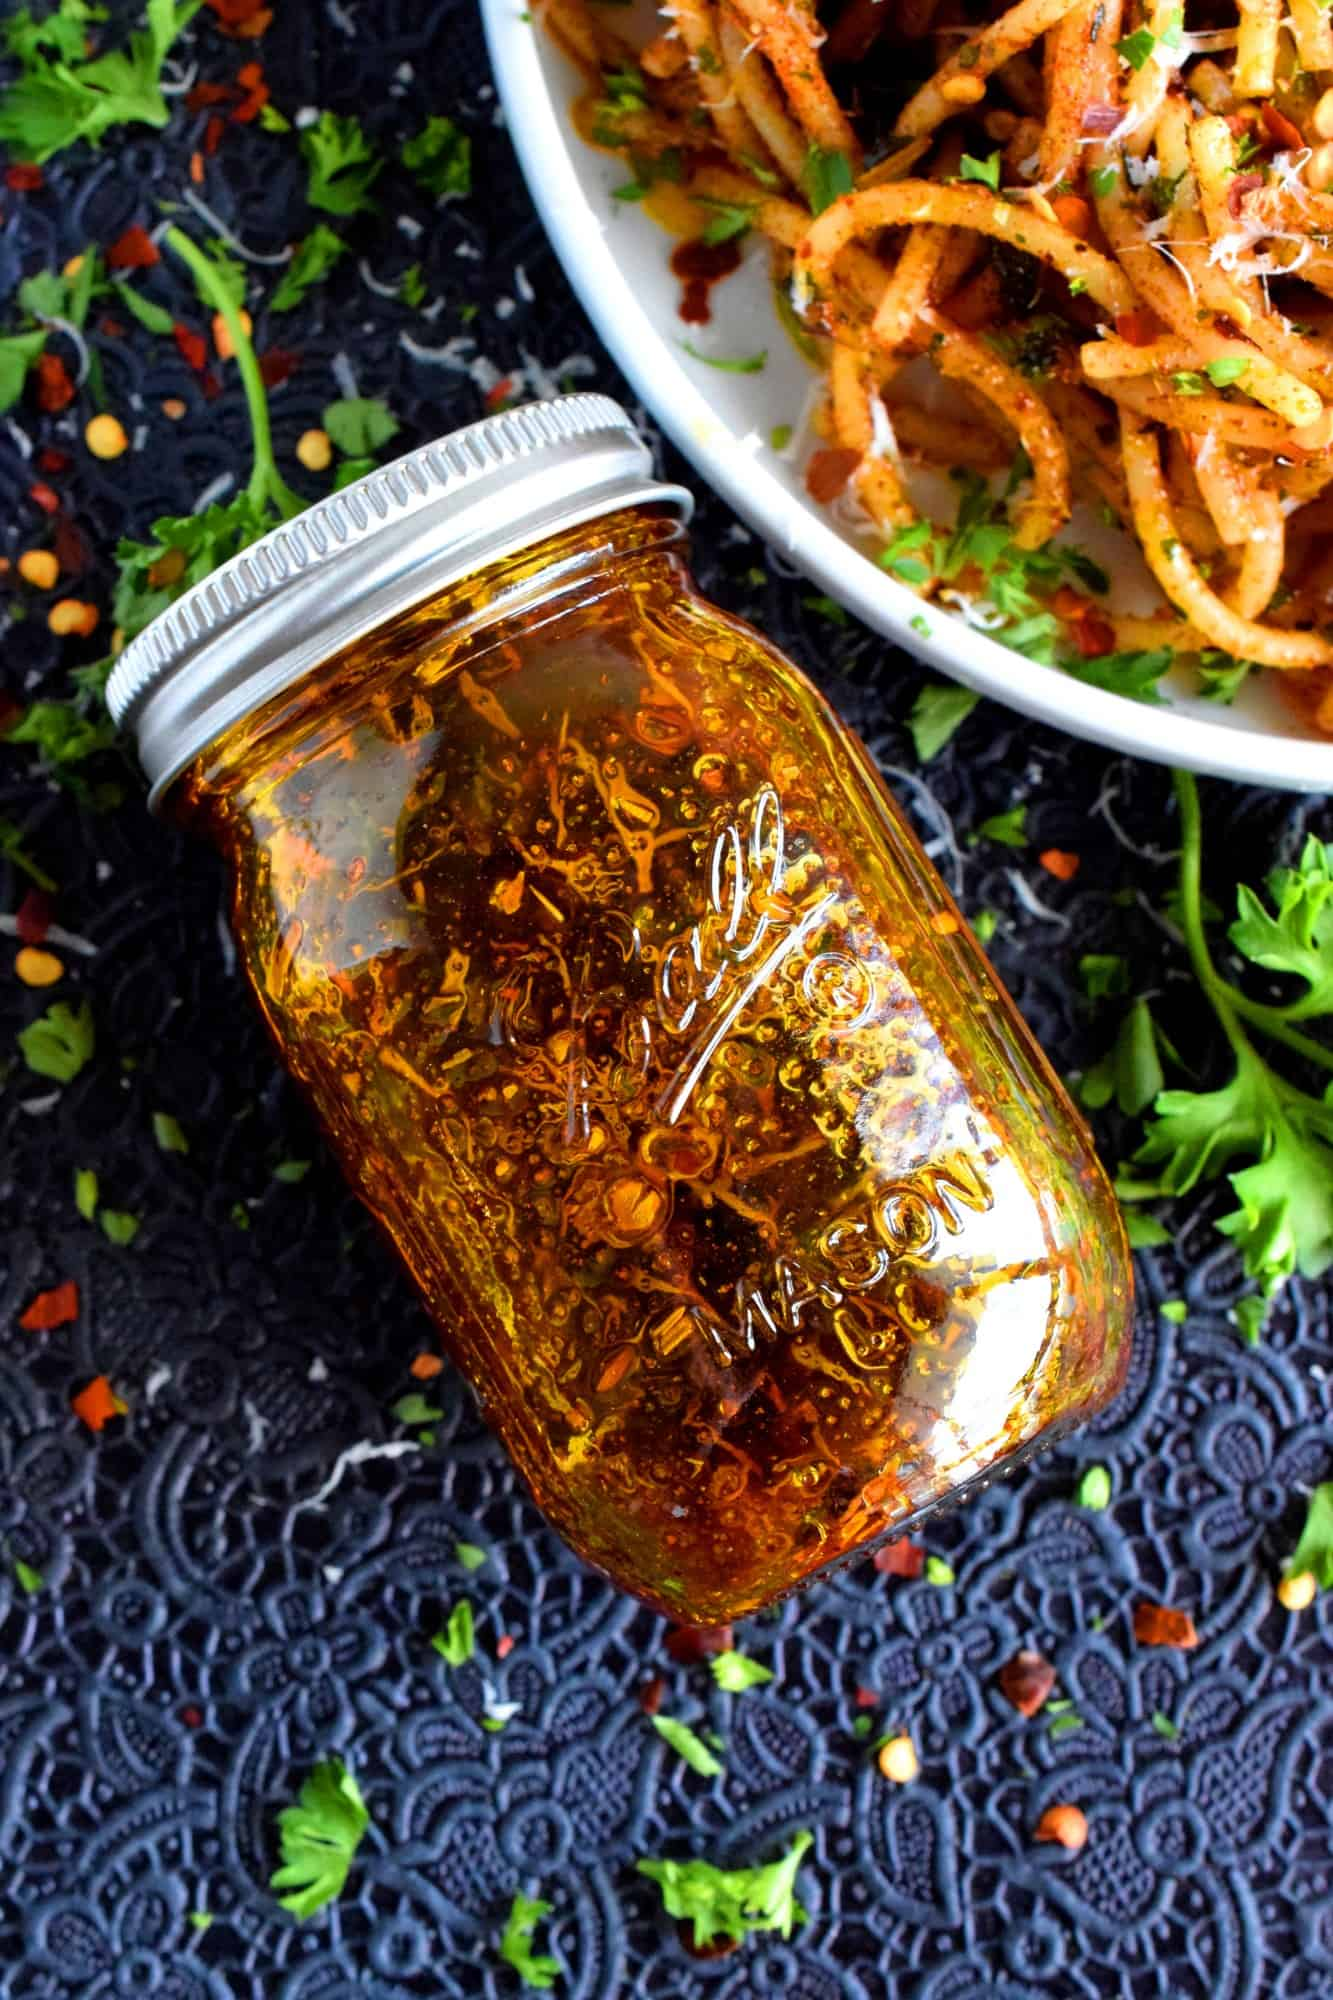 Spice Rack Sauce